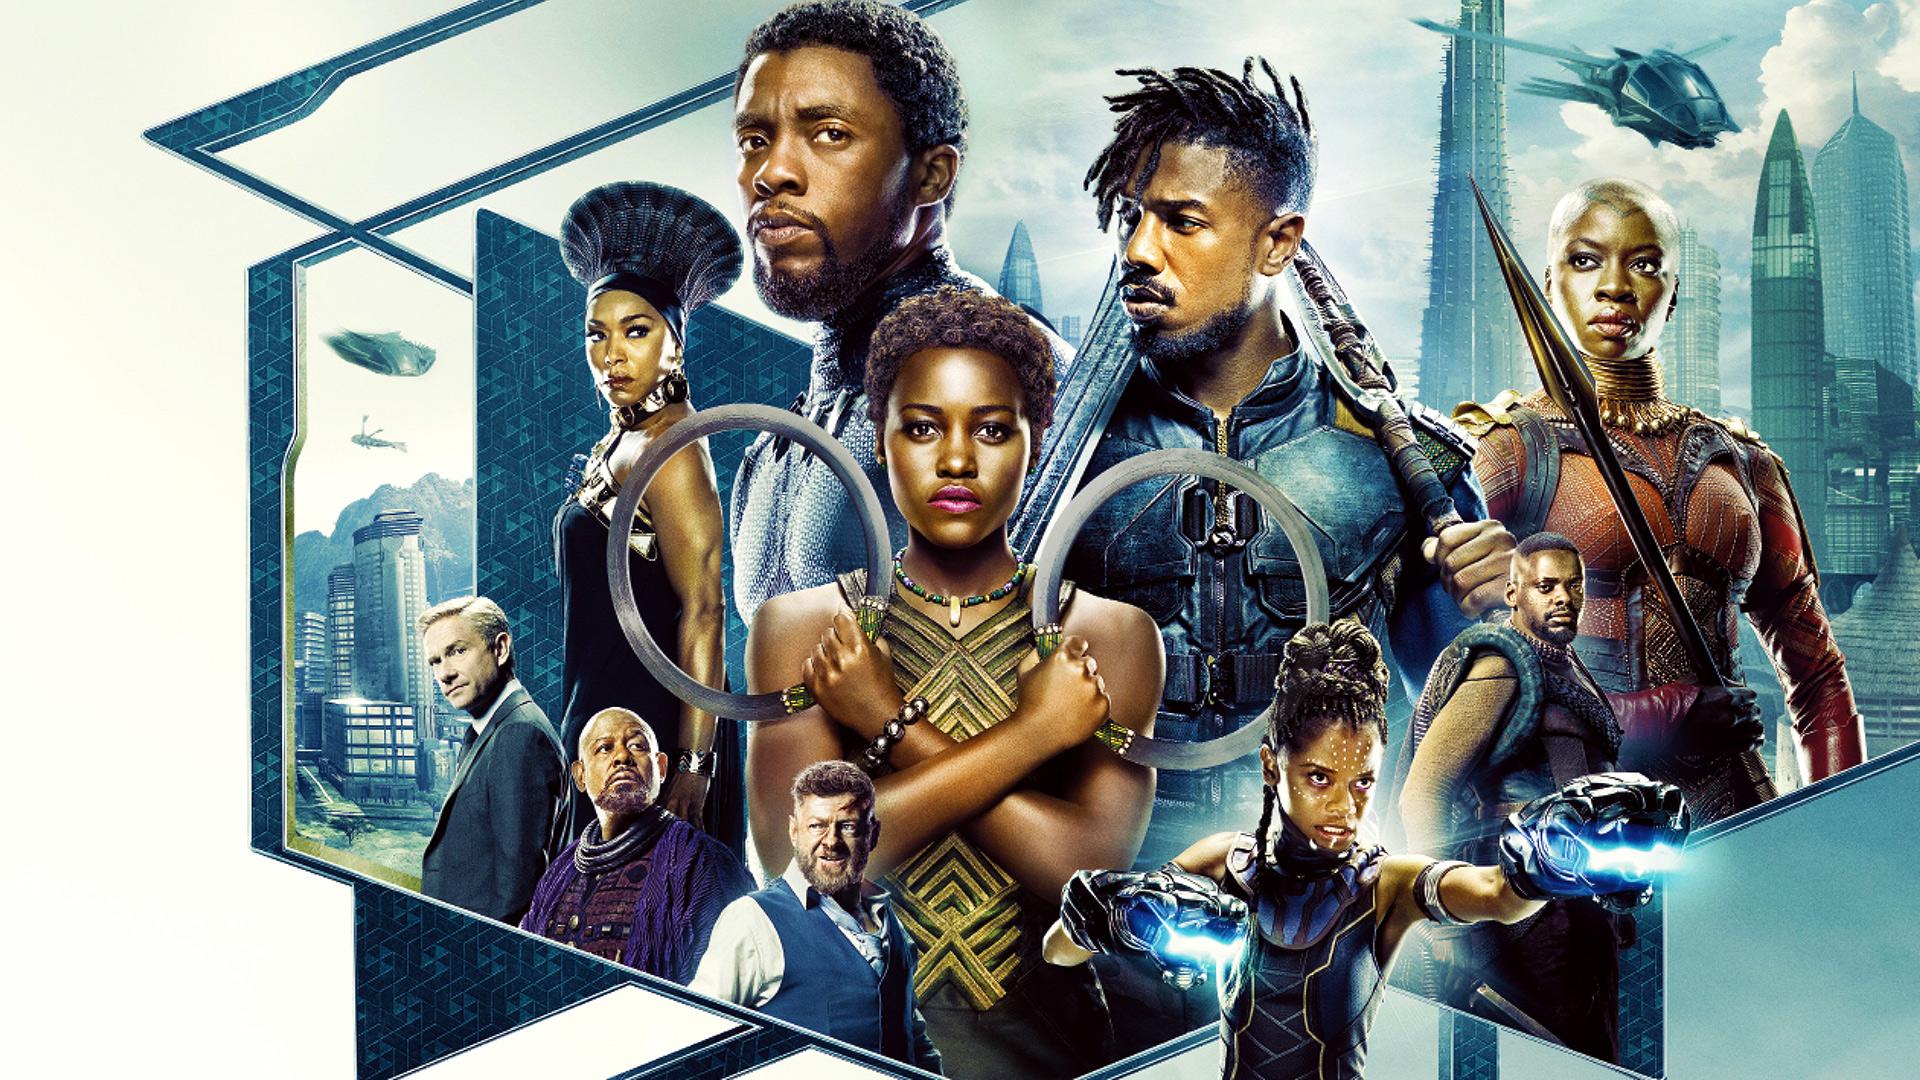 Movie Fanart: Black Panther